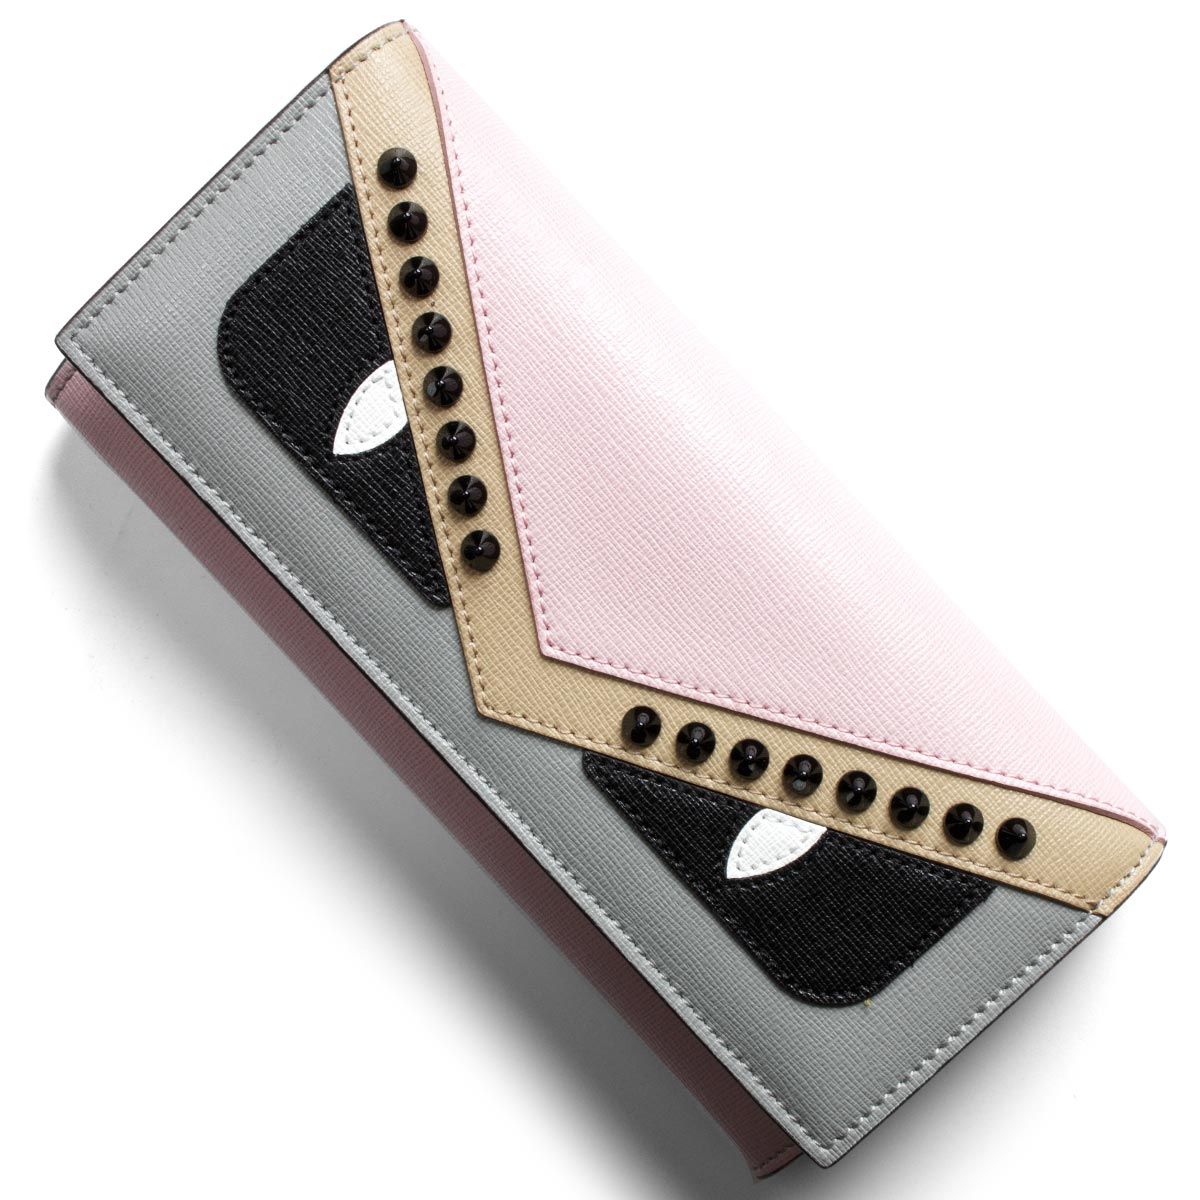 a9aec0c2f0d6 フェンディ 二つ折り財布 ルイヴィトン 長財布 財布 レディース ...